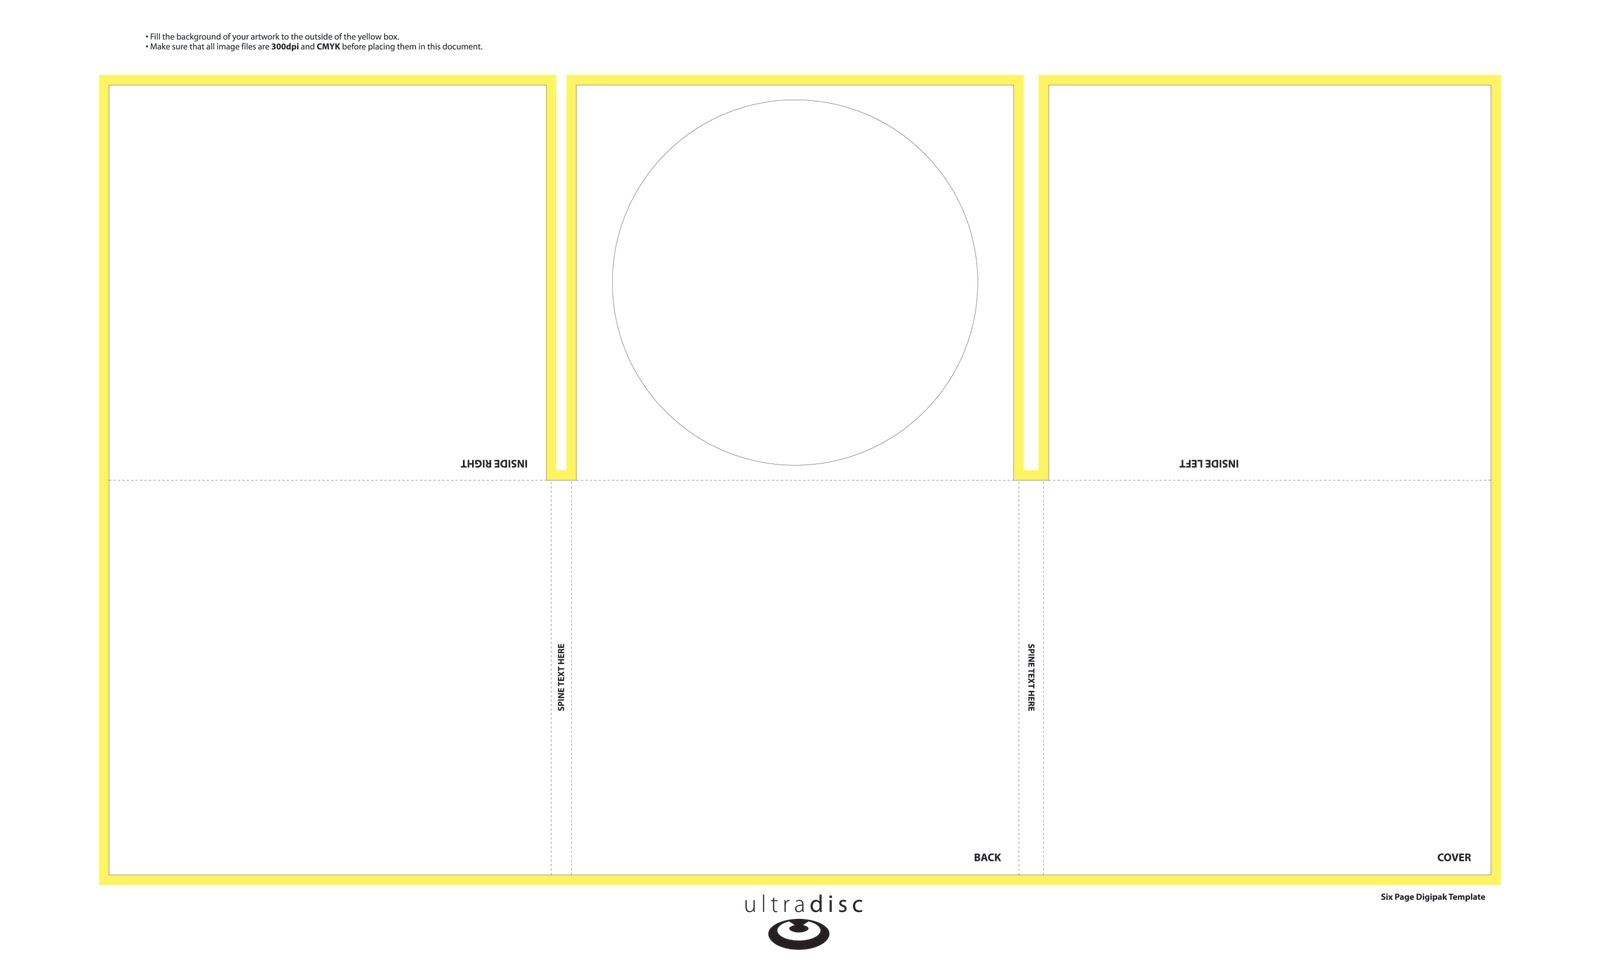 david pitt a2 media digipak template. Black Bedroom Furniture Sets. Home Design Ideas